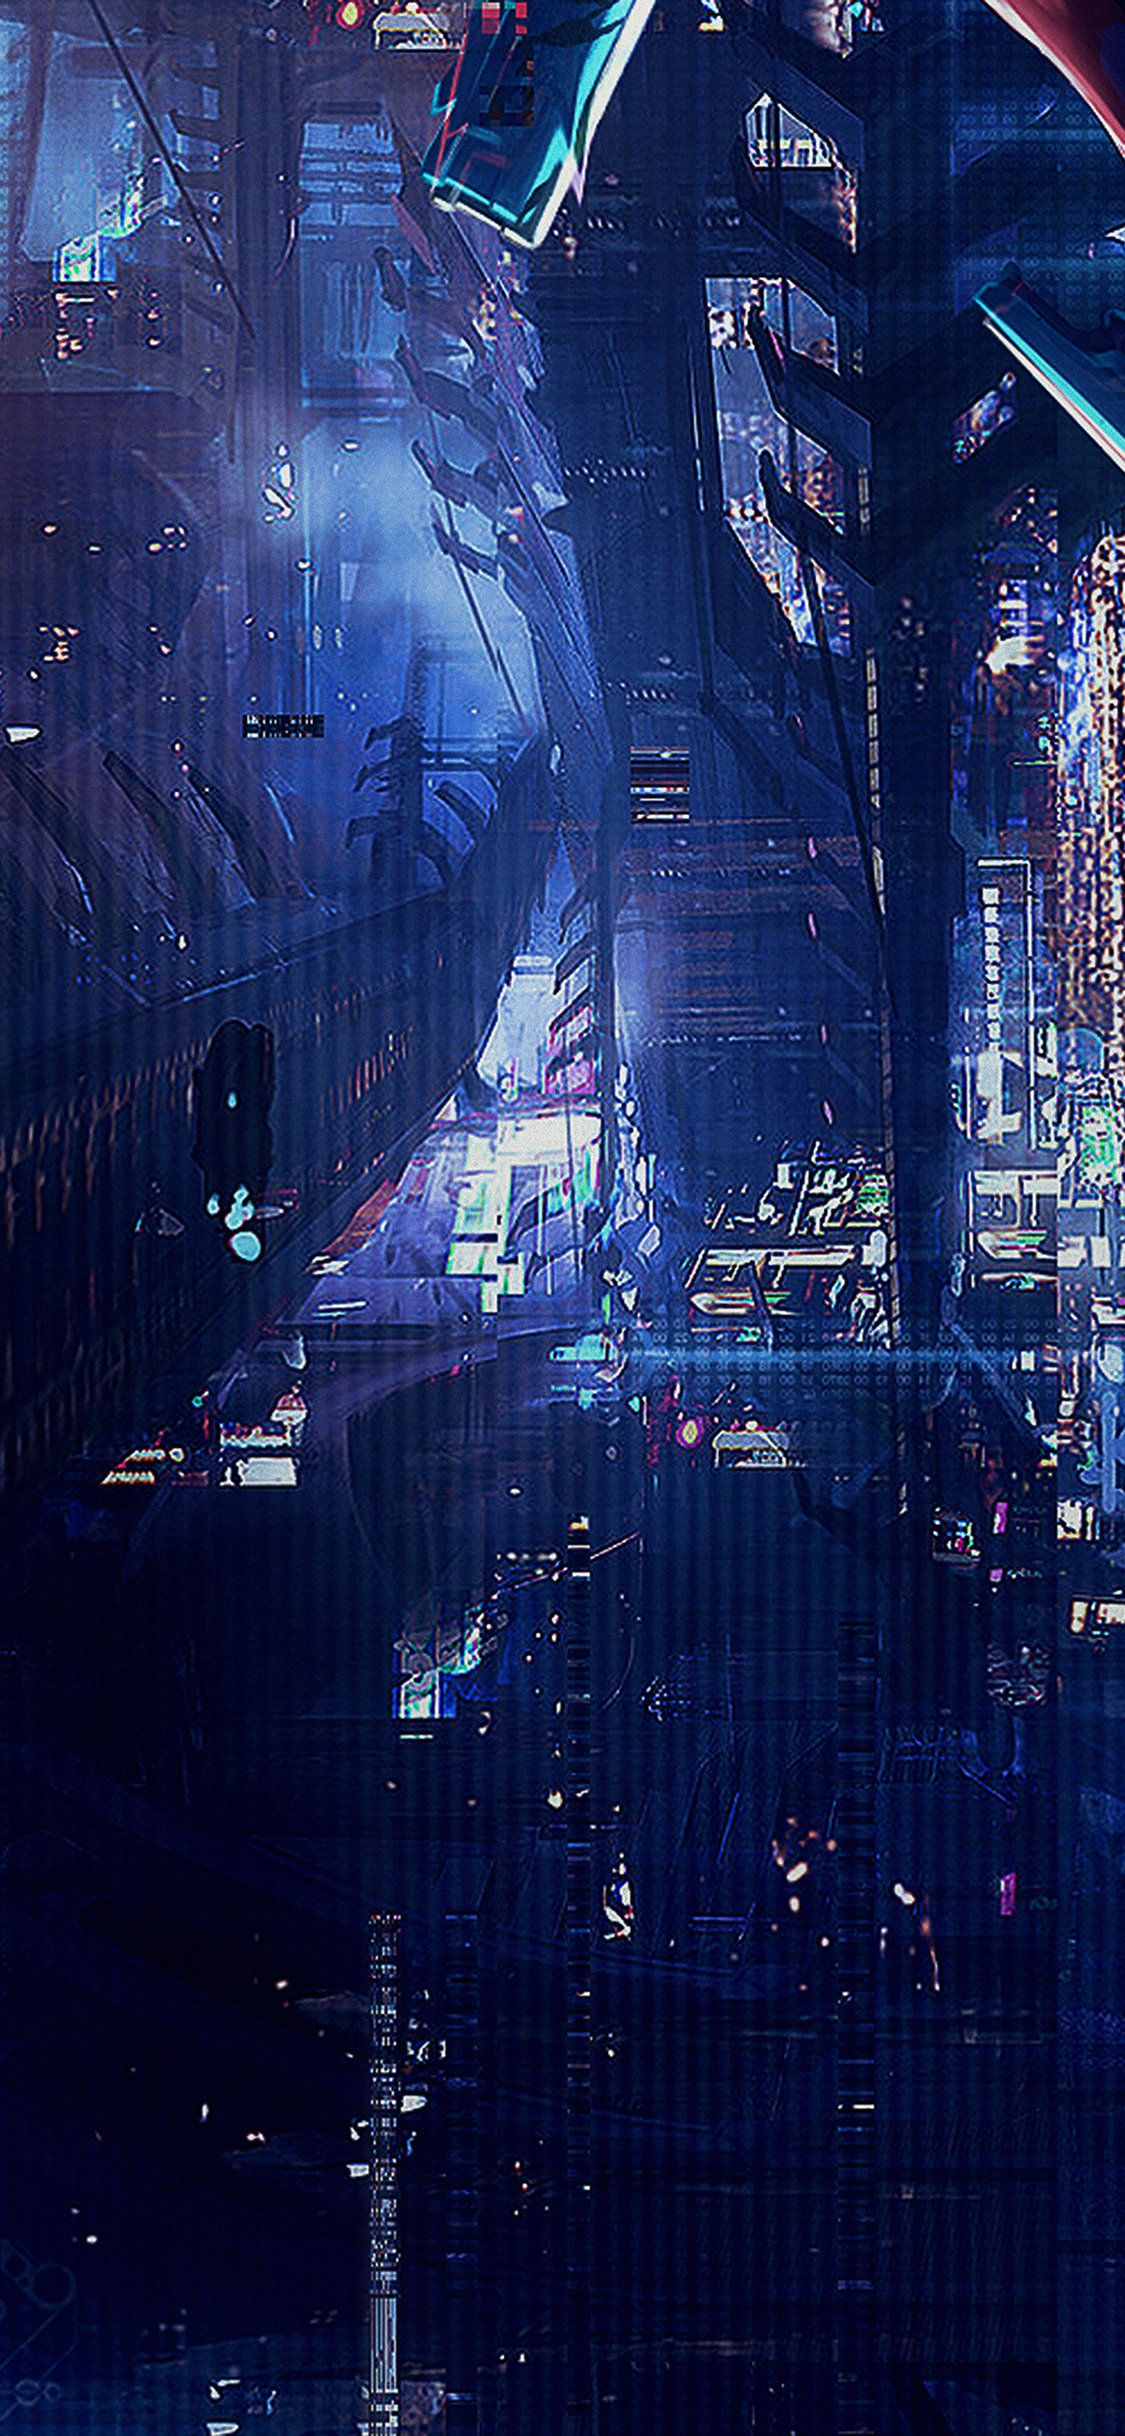 Iphonexpapers Af77 Digital World Anime Art Illust Urban